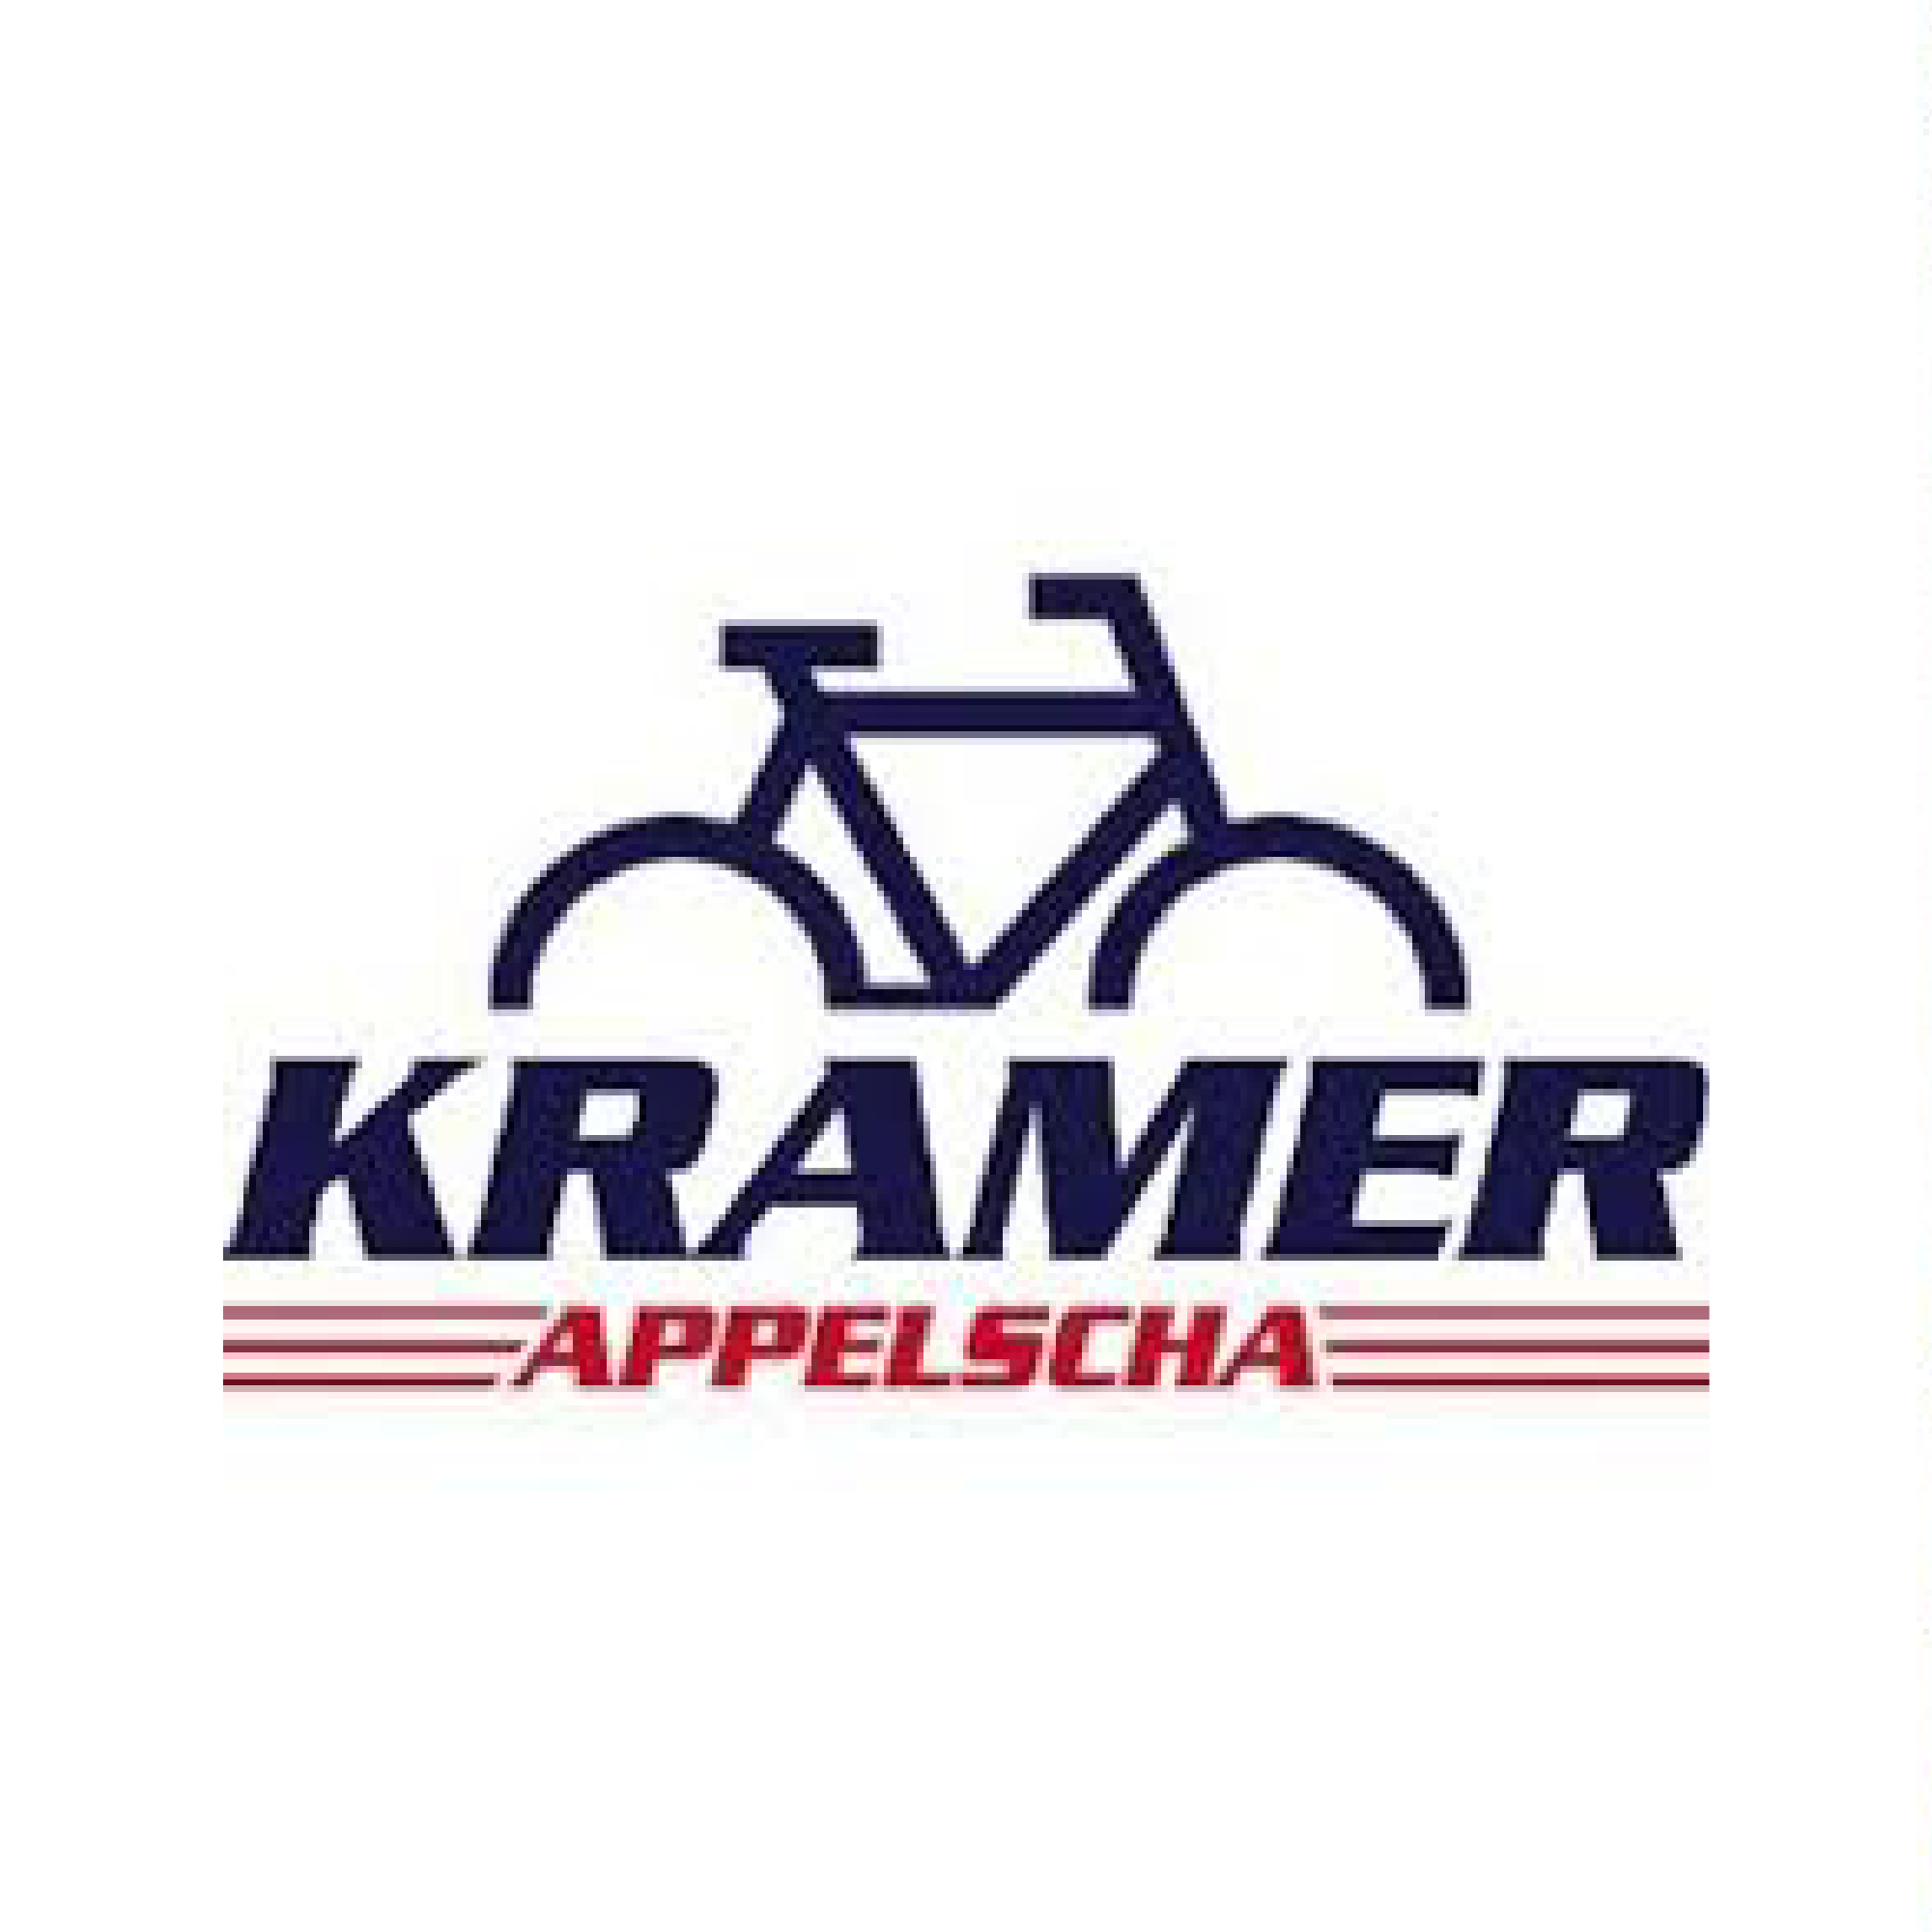 Kramer Appelscha